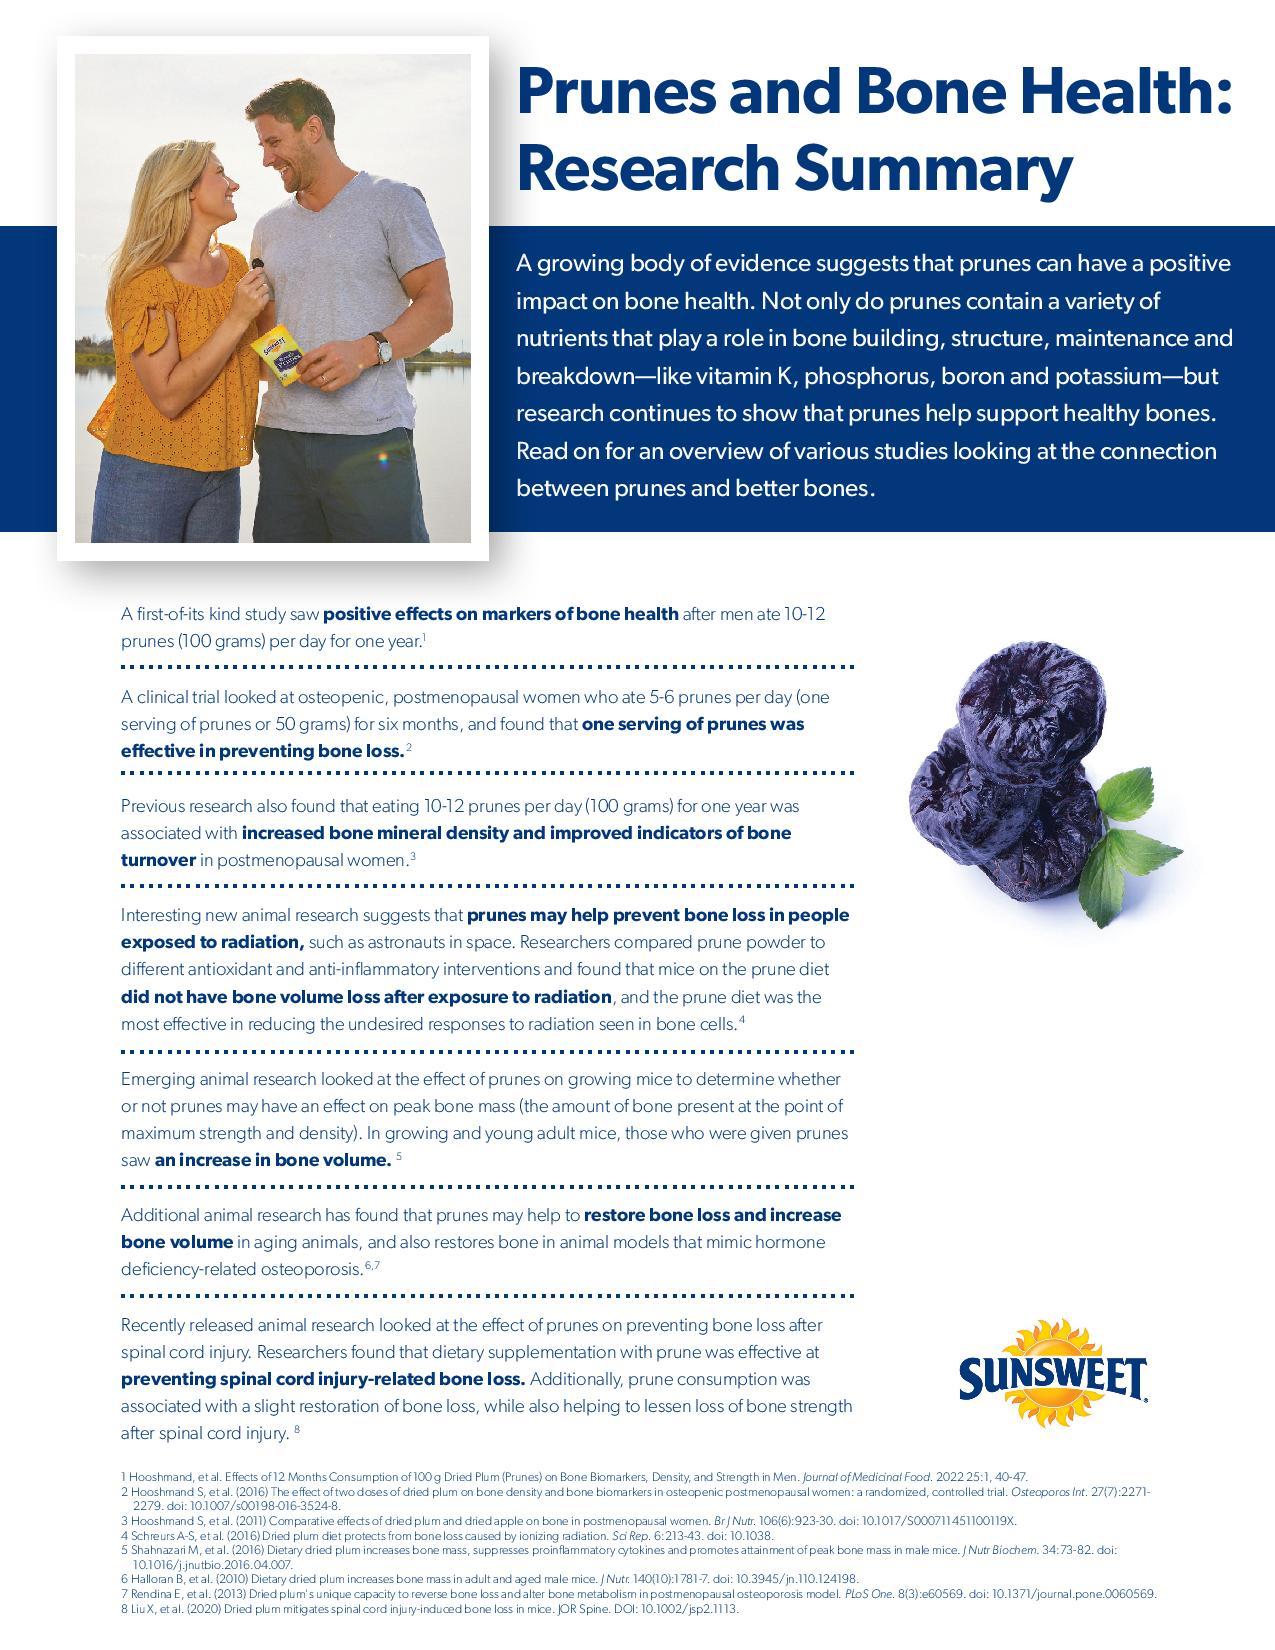 Sunsweet Bone Health Research Summary